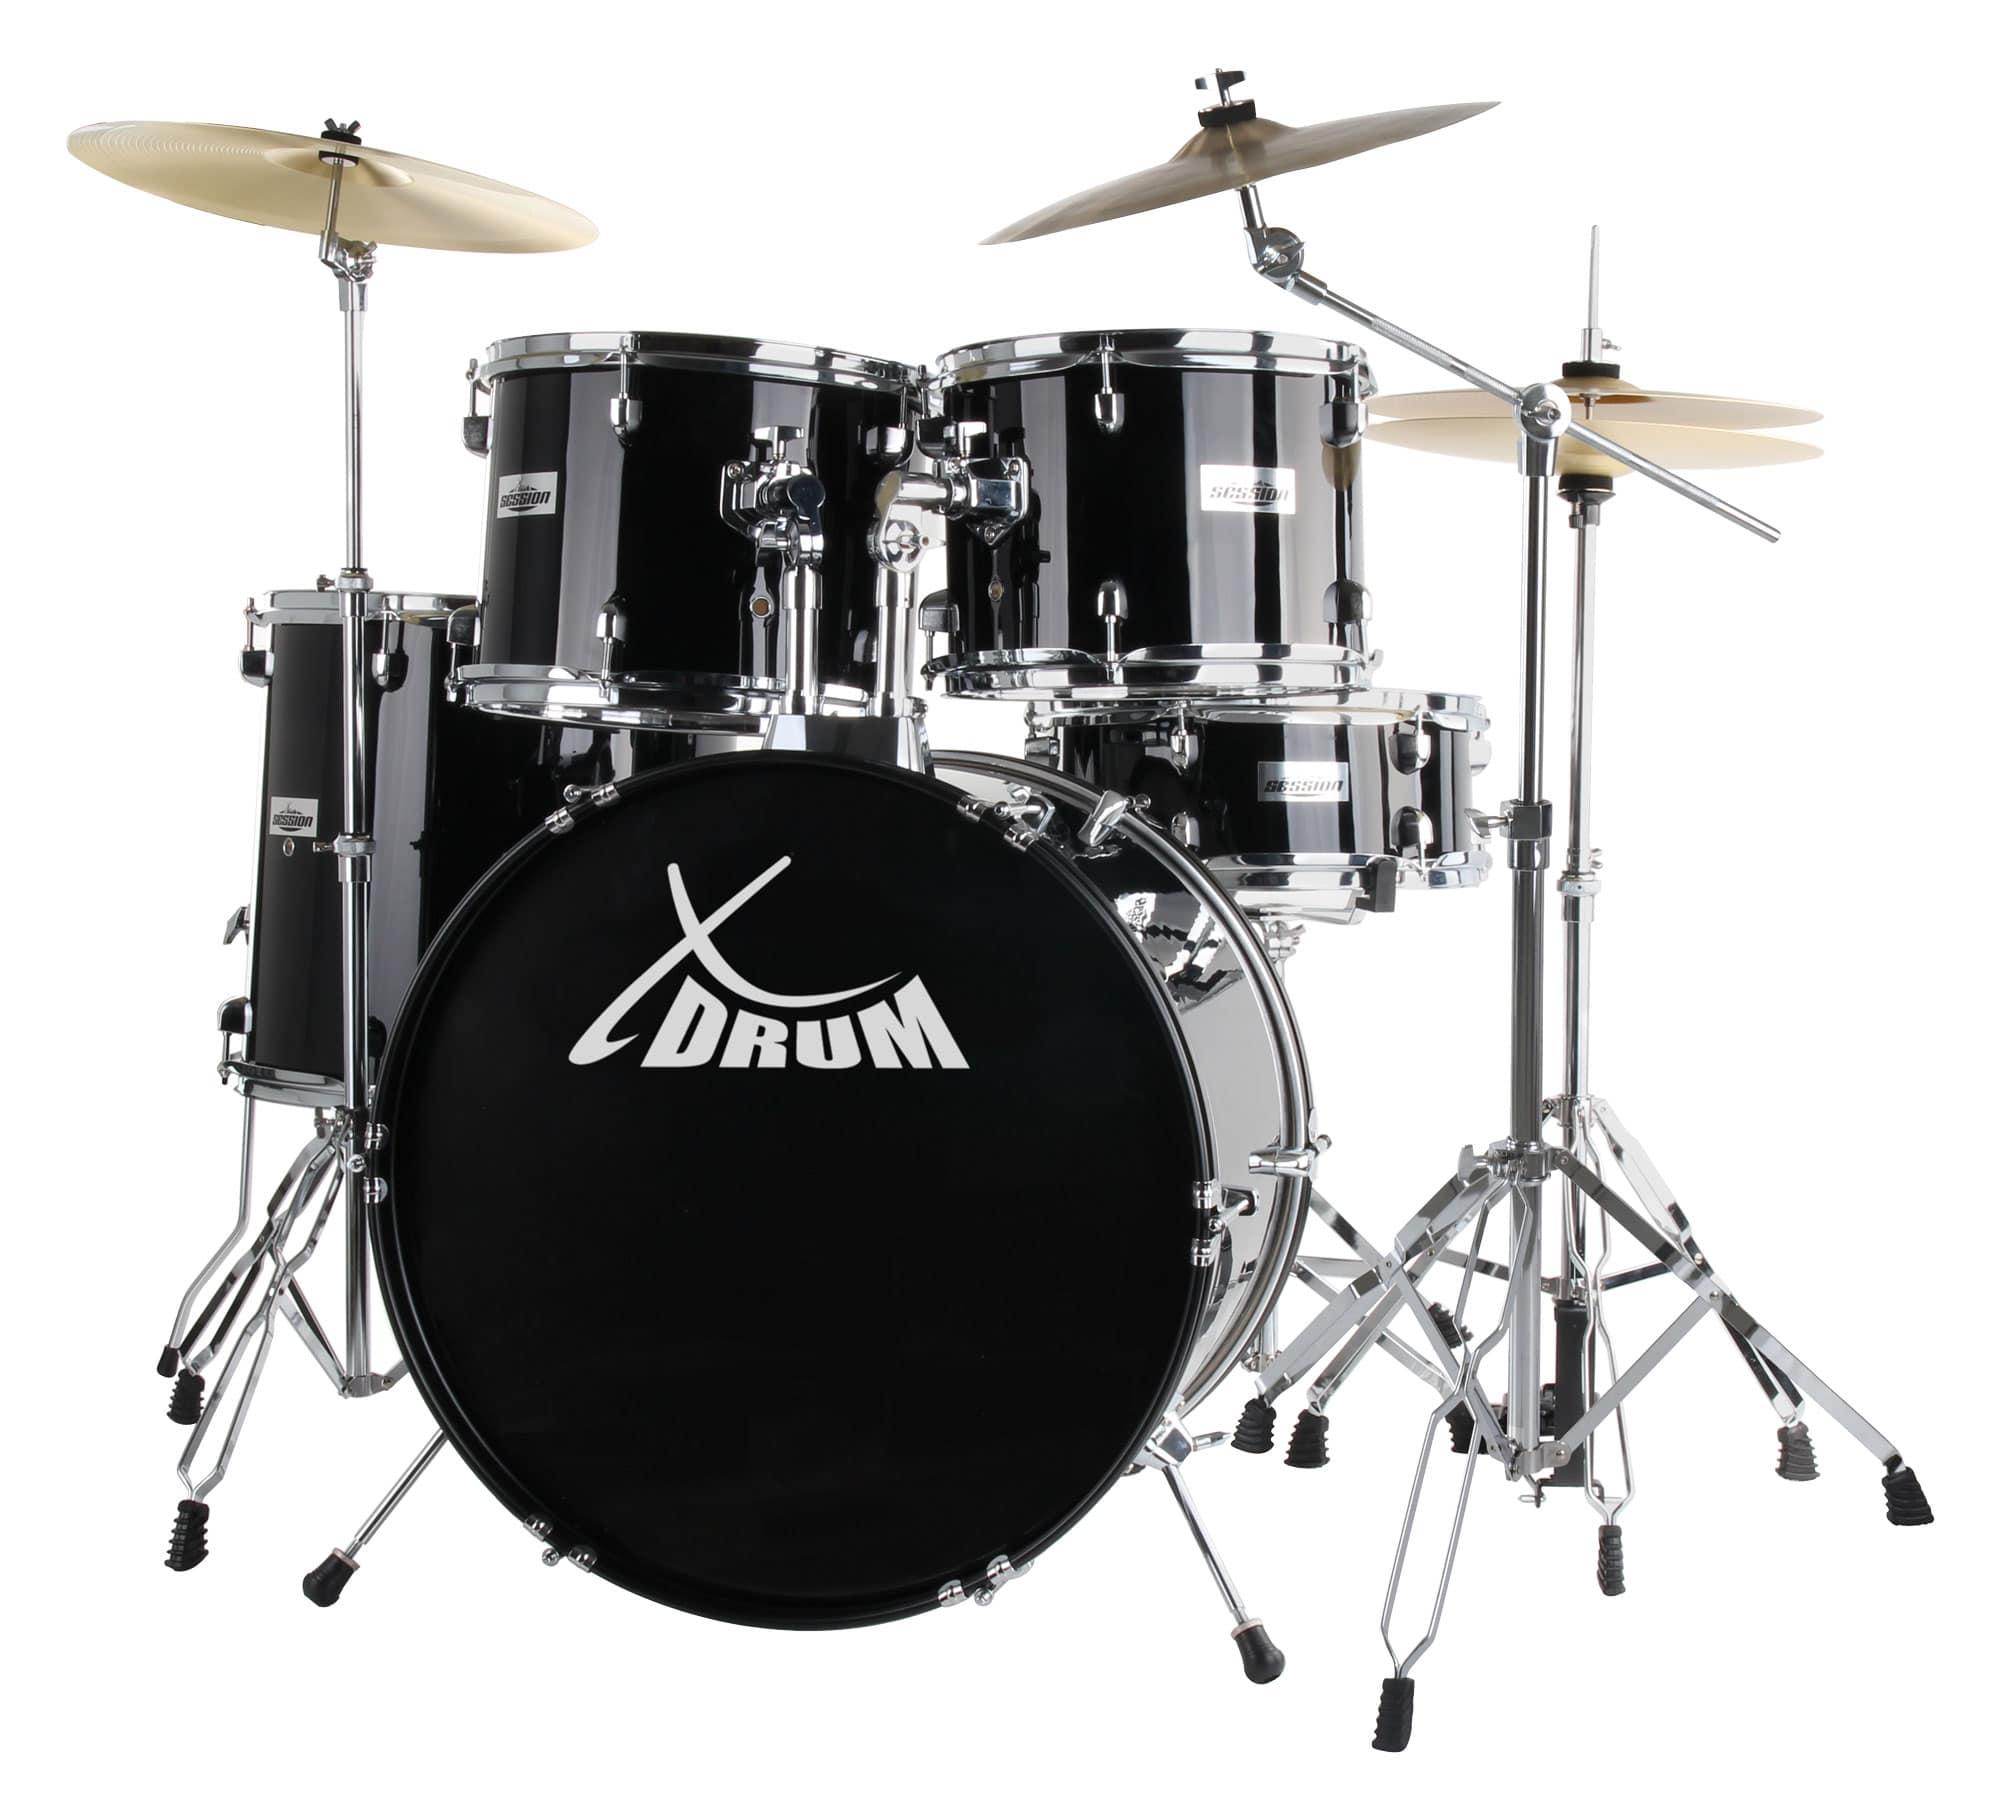 Bateria-Acustica-Tambor-22-034-Percusion-Drum-Set-Soporte-de-Brazo-Platillos-Pedale